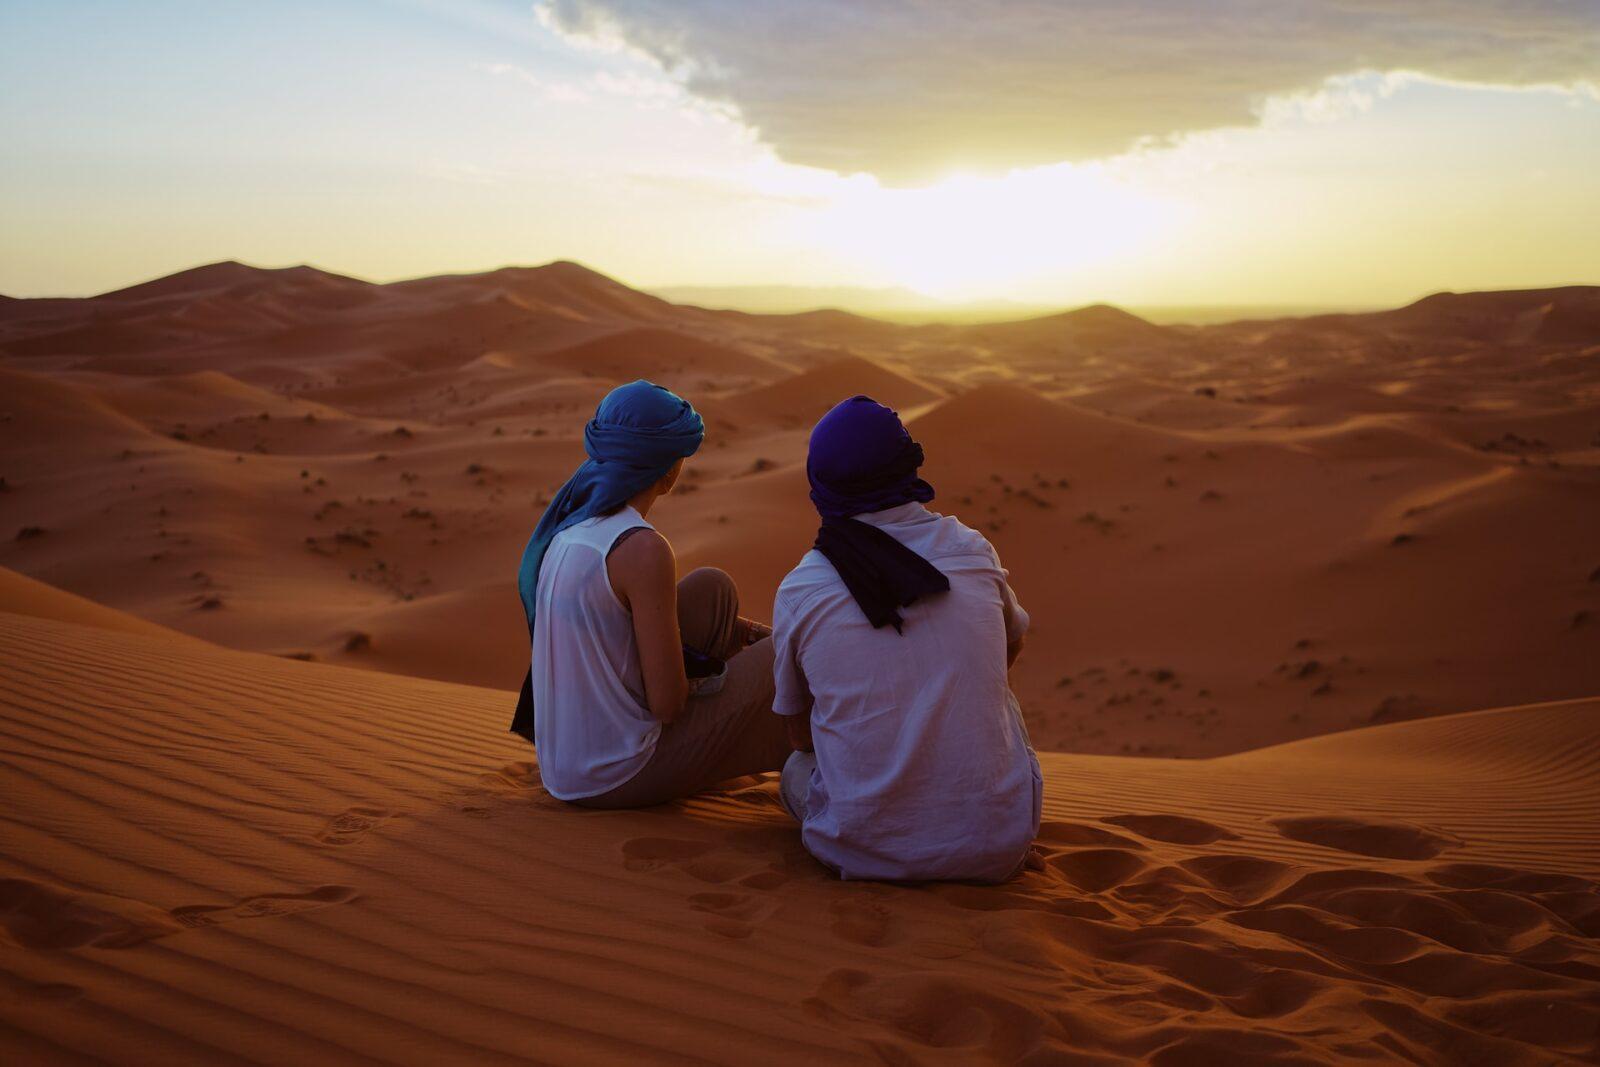 ignacio ceballos eP94dHUaY1U unsplash 1536x1024 - Guide Morocco Tours